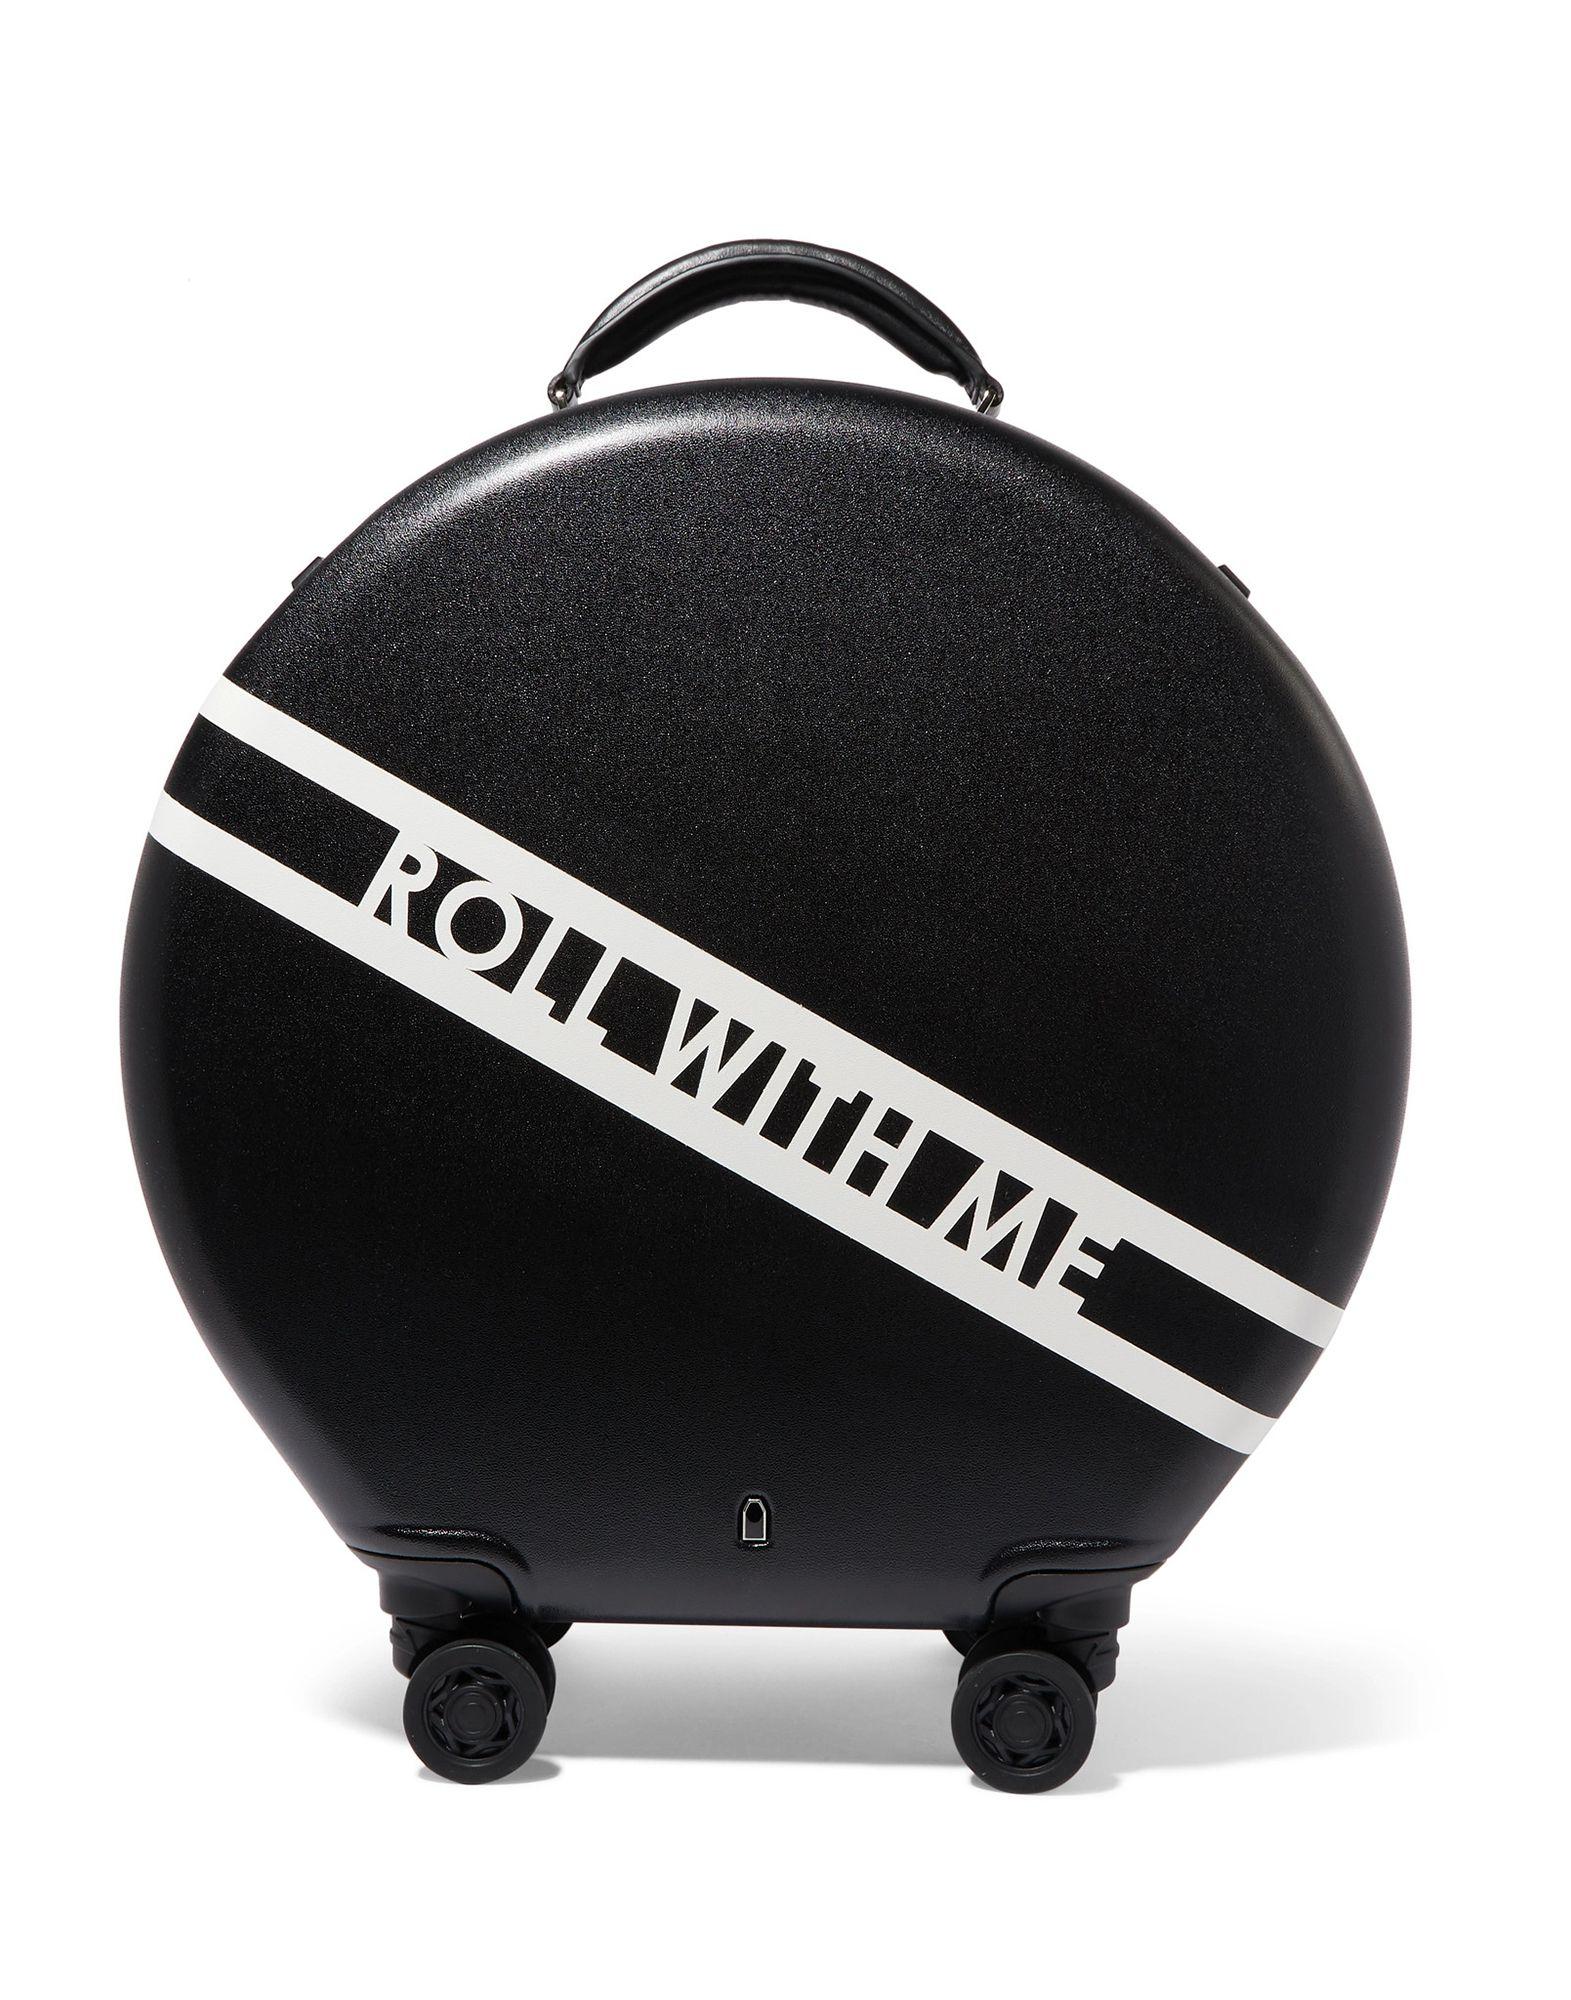 OOKONN Чемодан/сумка на колесиках чемодан на колесиках trunki чемодан на колесиках